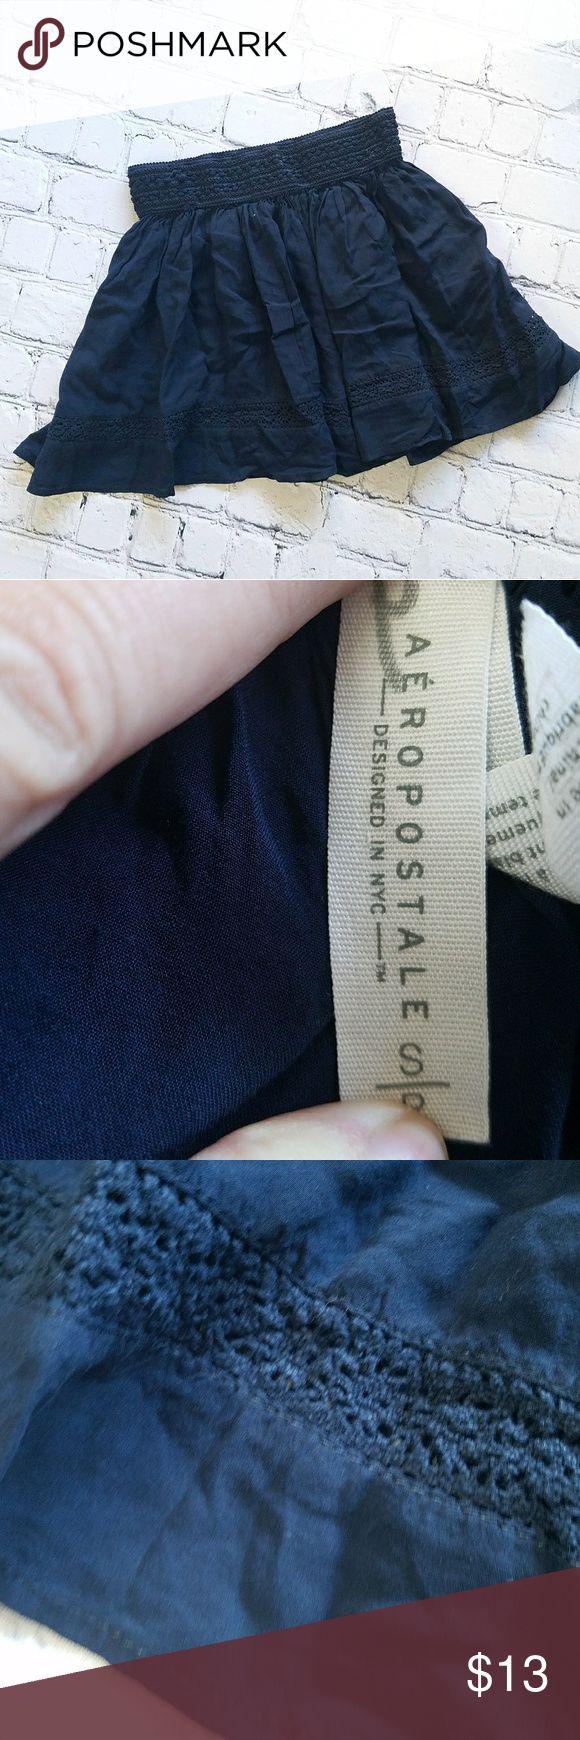 "Aeropostale Navy Blue Flirty Fun Skirt Sz Small Navy Blue flirty flouncy skirt Aeropostale brand Juniors Size Small Great condition No lining Super short mini Rayon & cotton  Measurements laying flat  Waist 12"" elastic waist Length 14.5"" Aeropostale Skirts Mini"